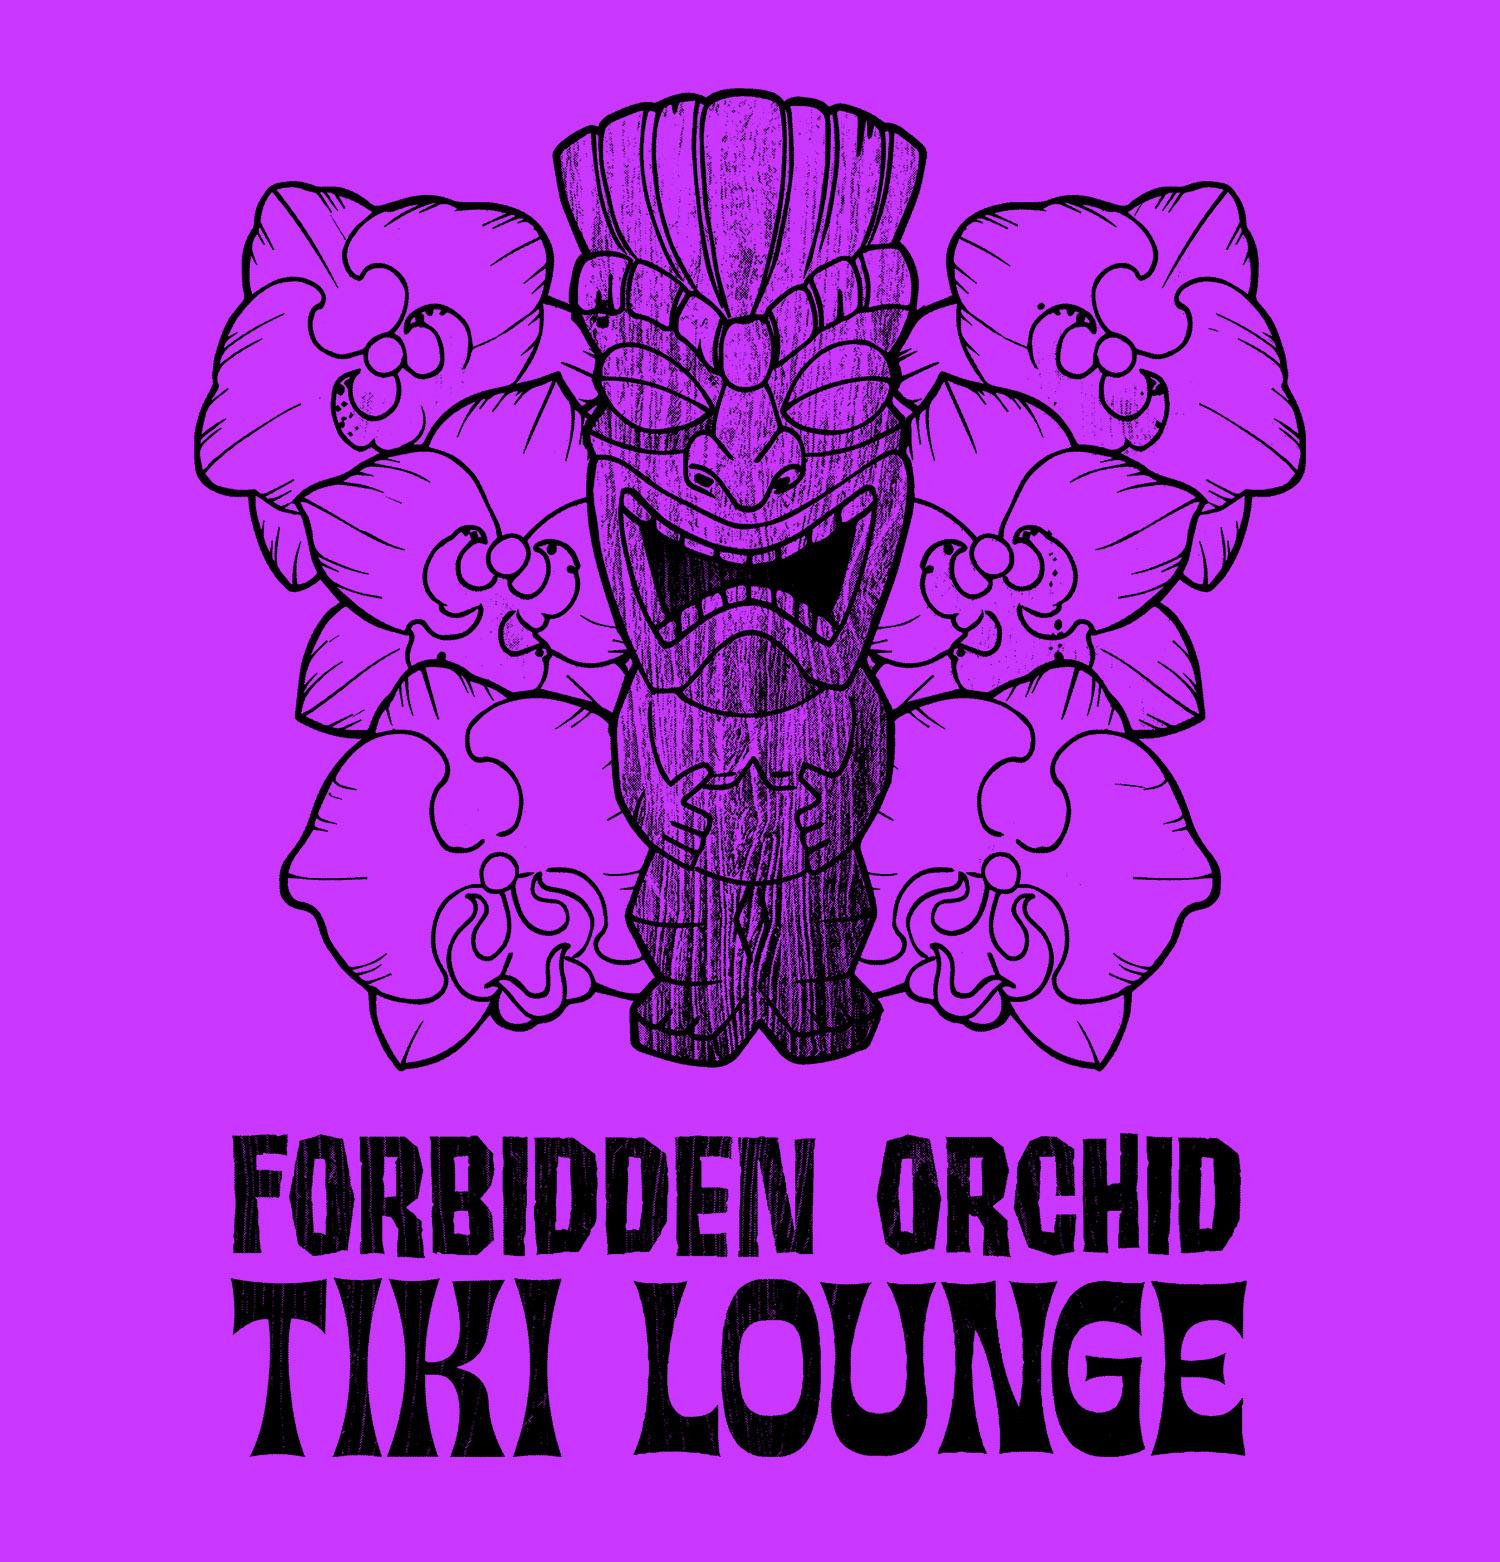 Forbidden Orchid Tiki Lounge